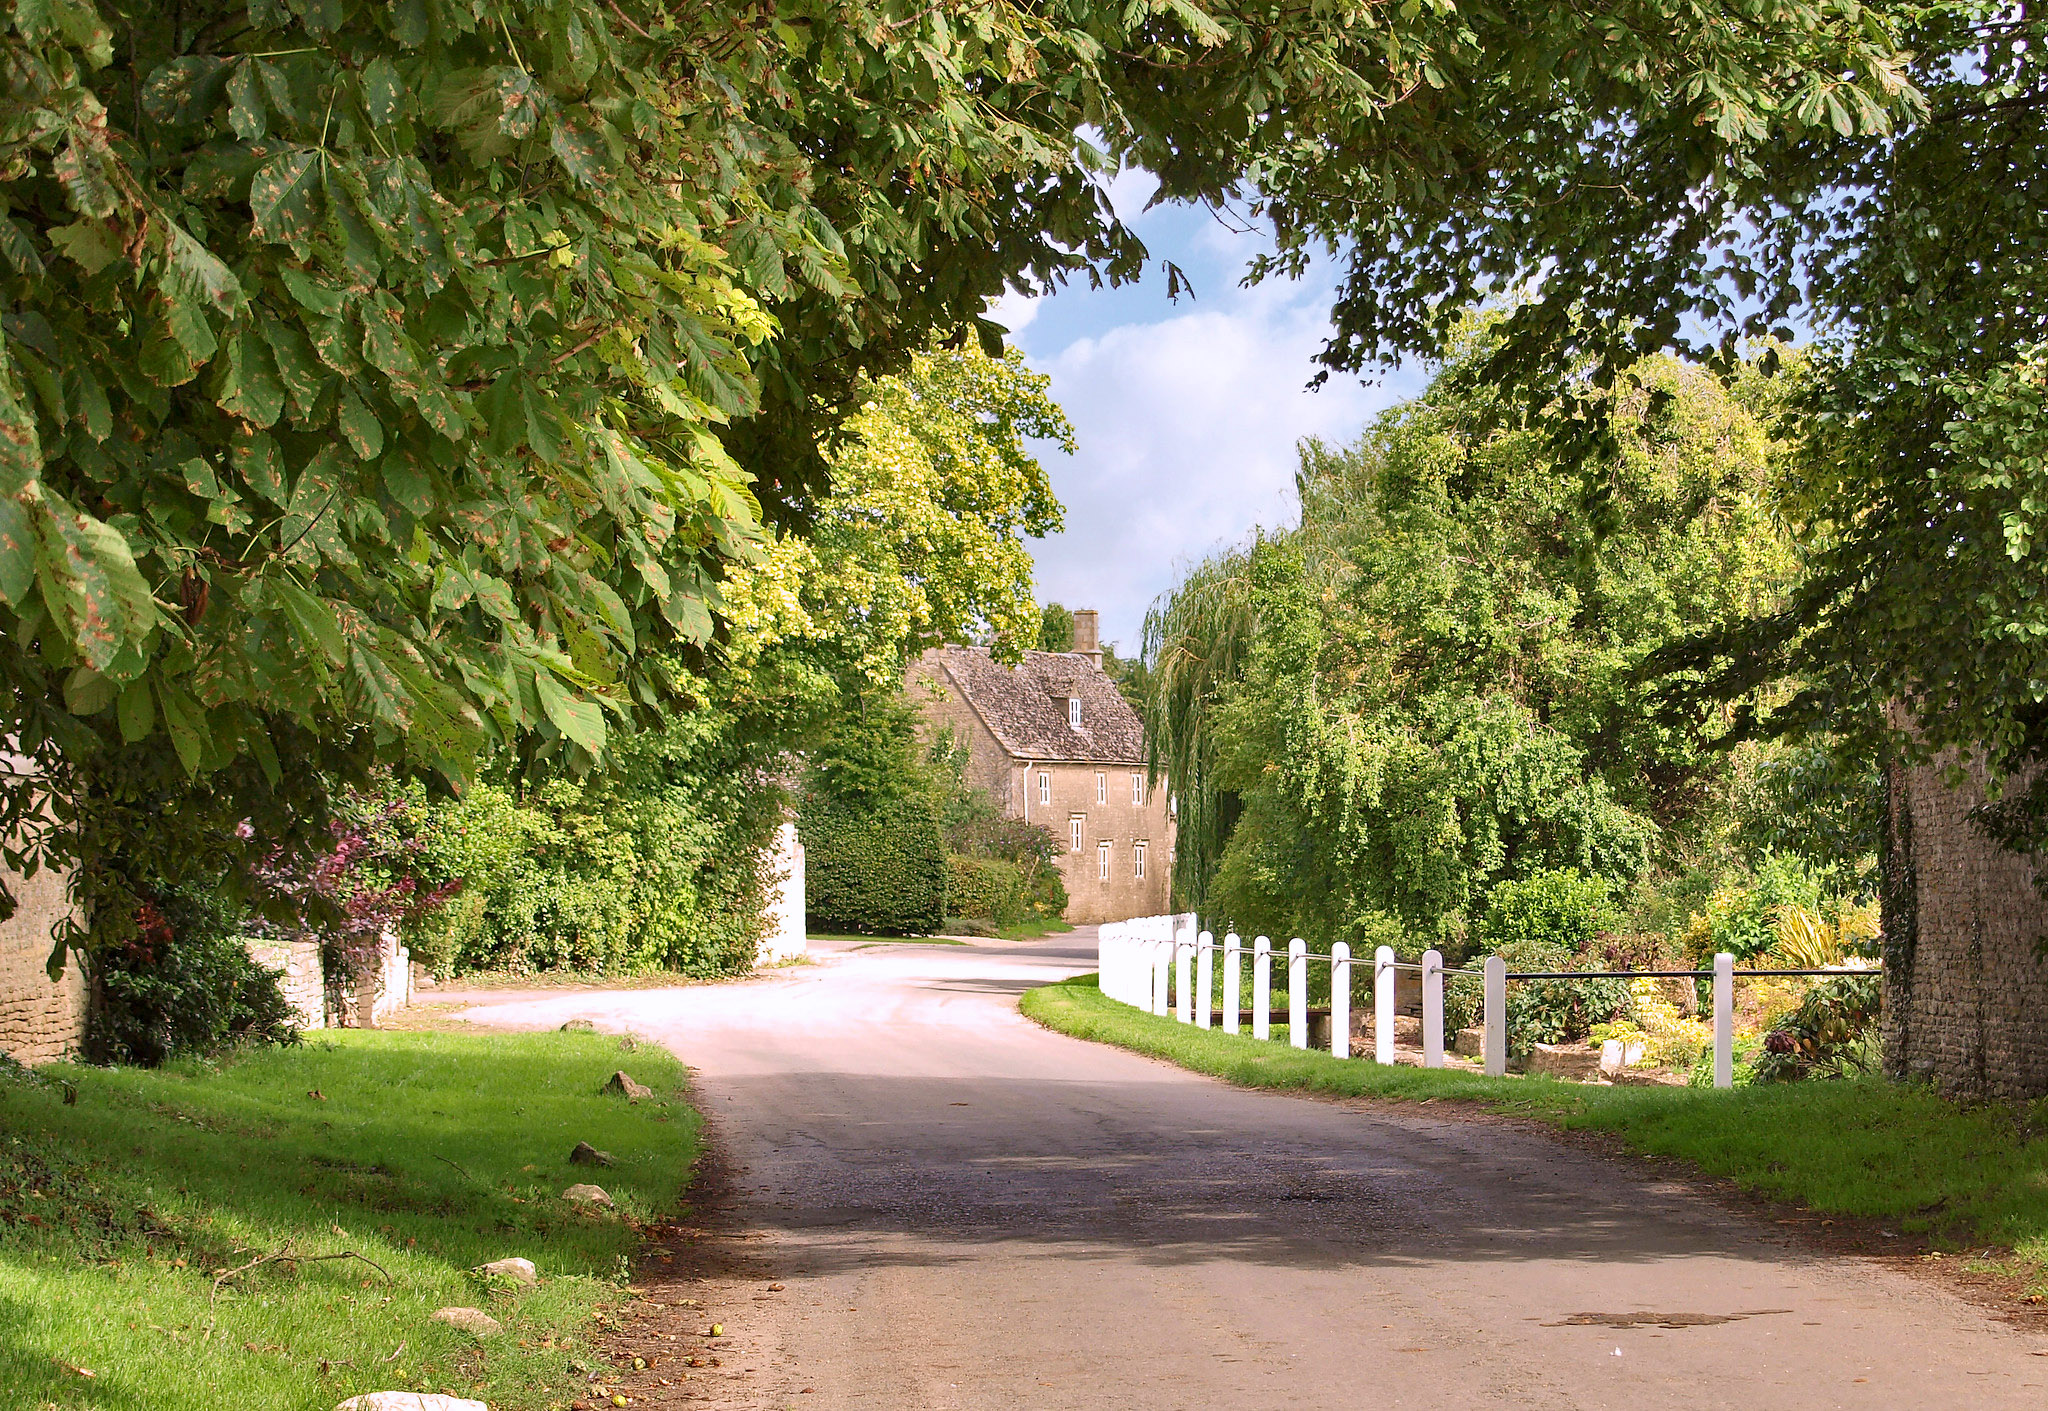 A lane in Kelmscott, deep in rural Oxfordshire by Andrew S Brown.jpg